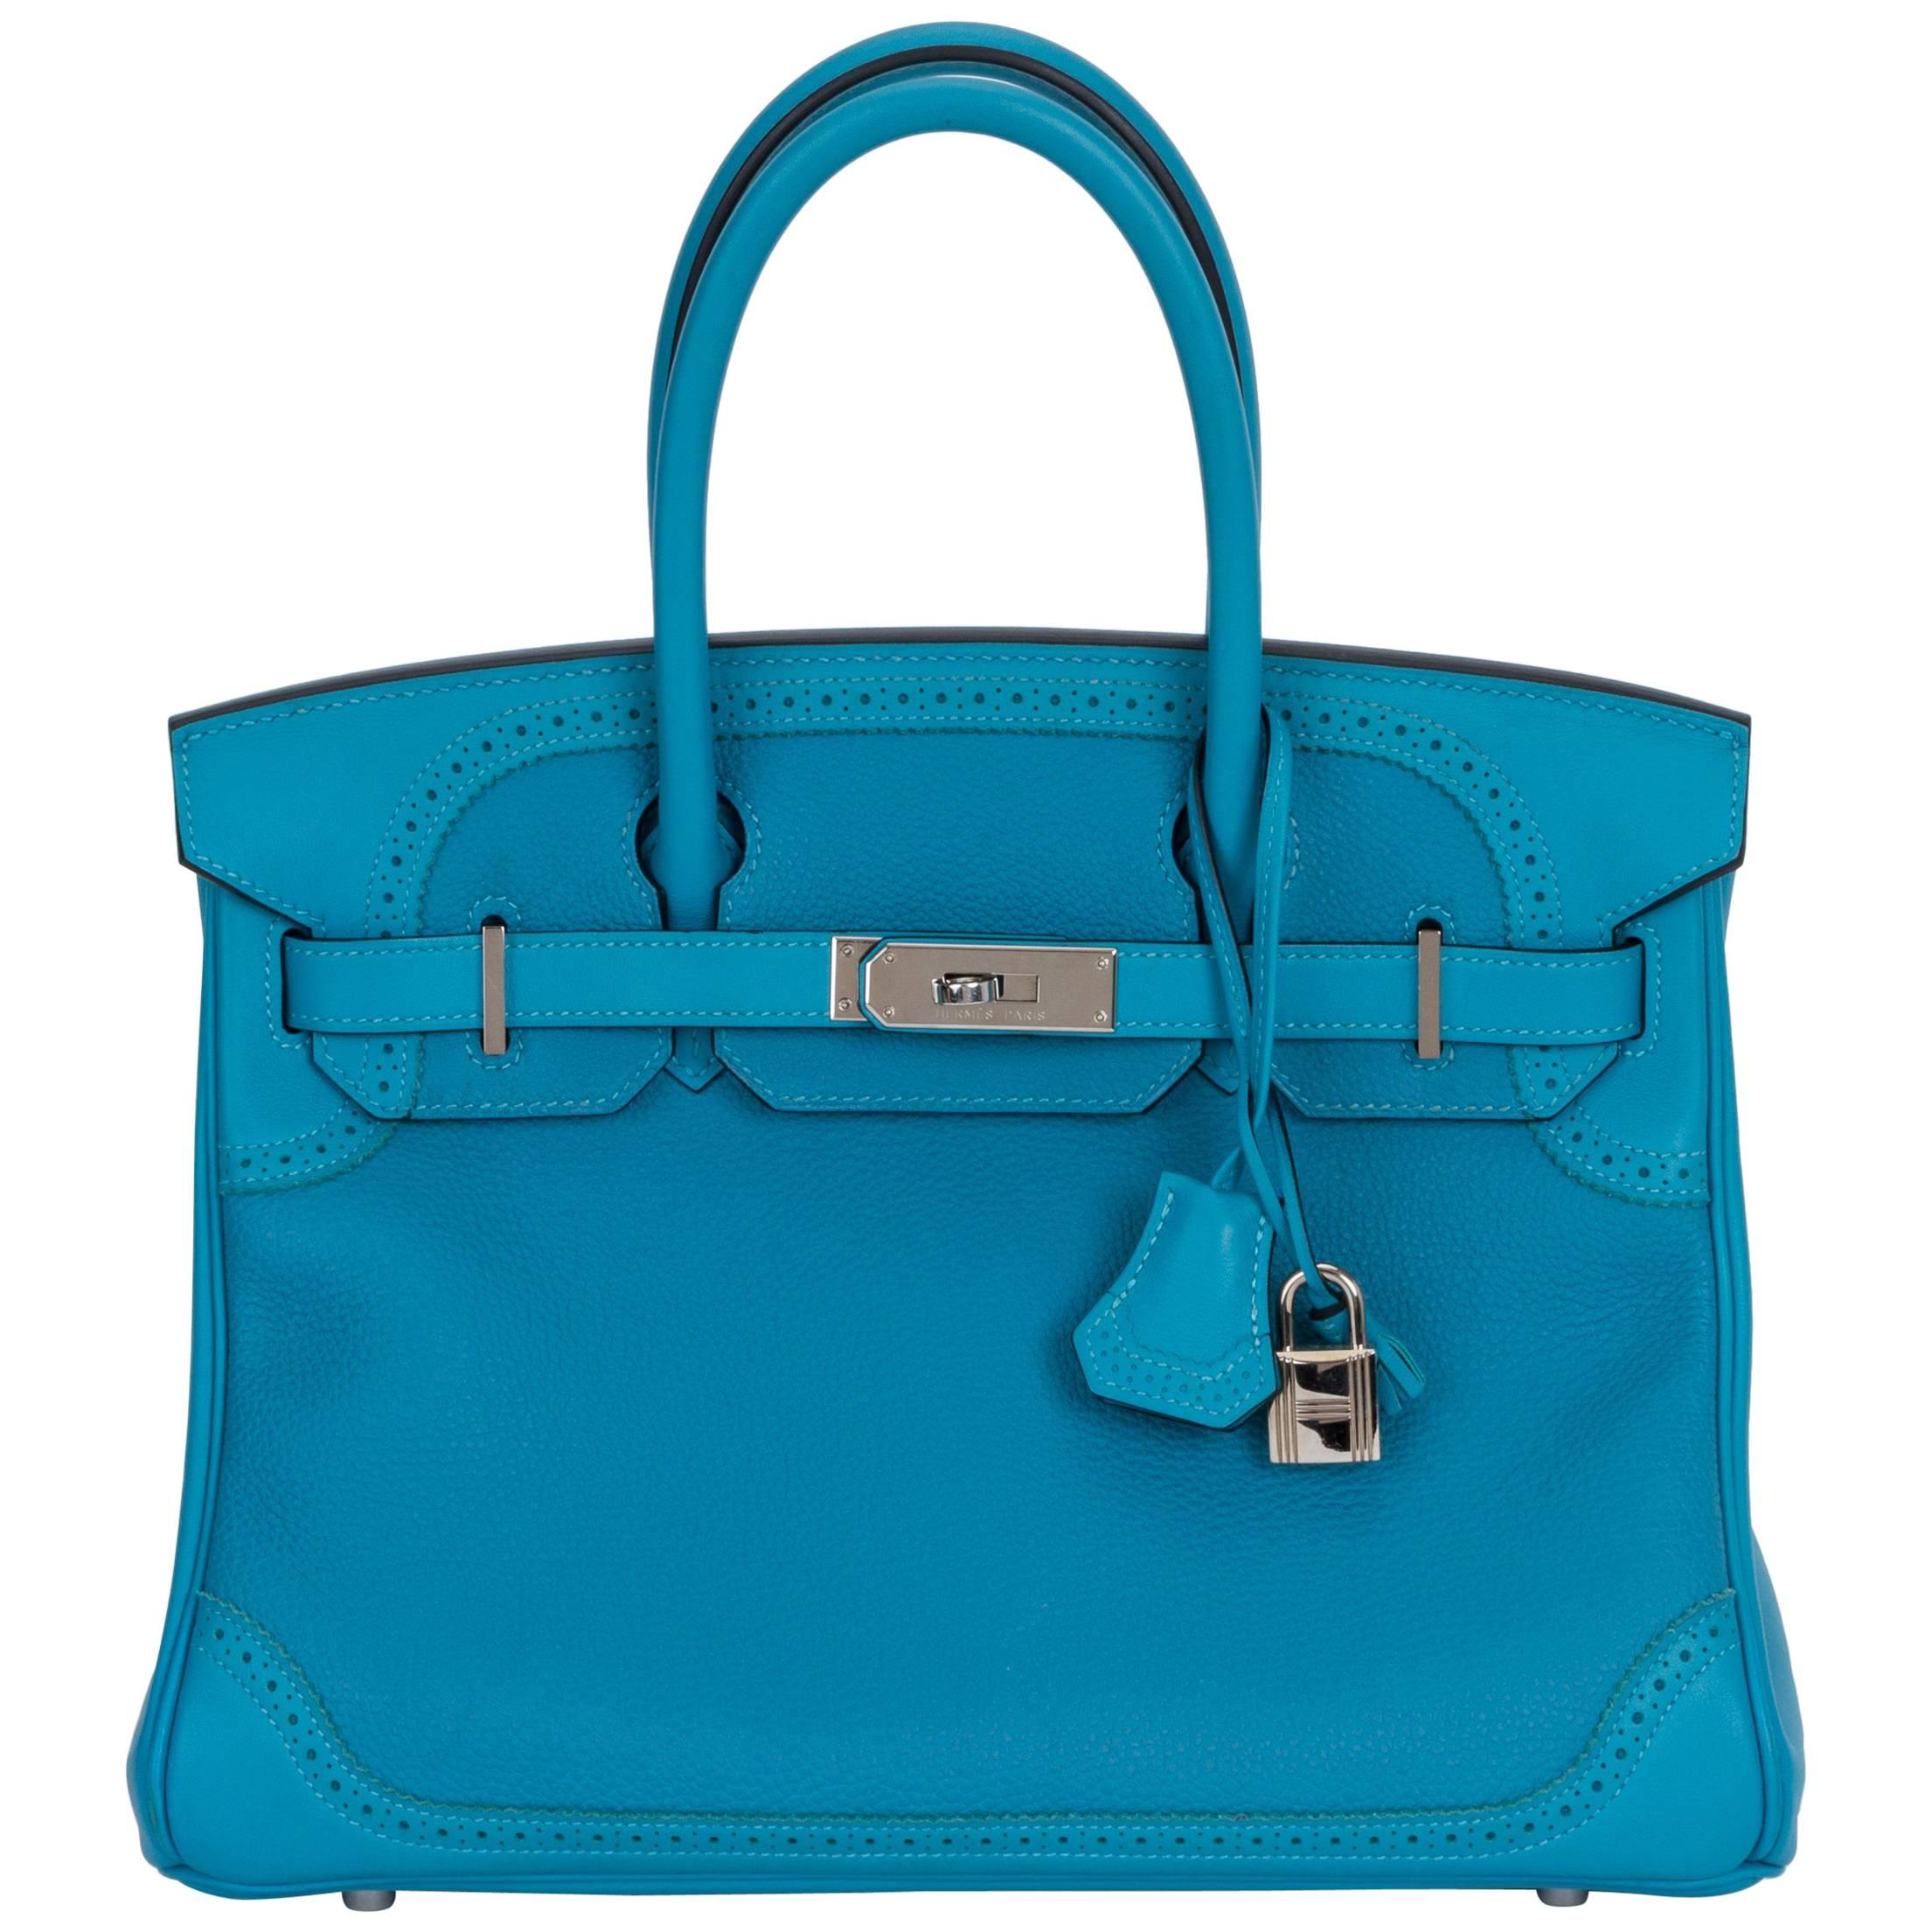 Hermes 30 Ghillies Turquoise Birkin Bag